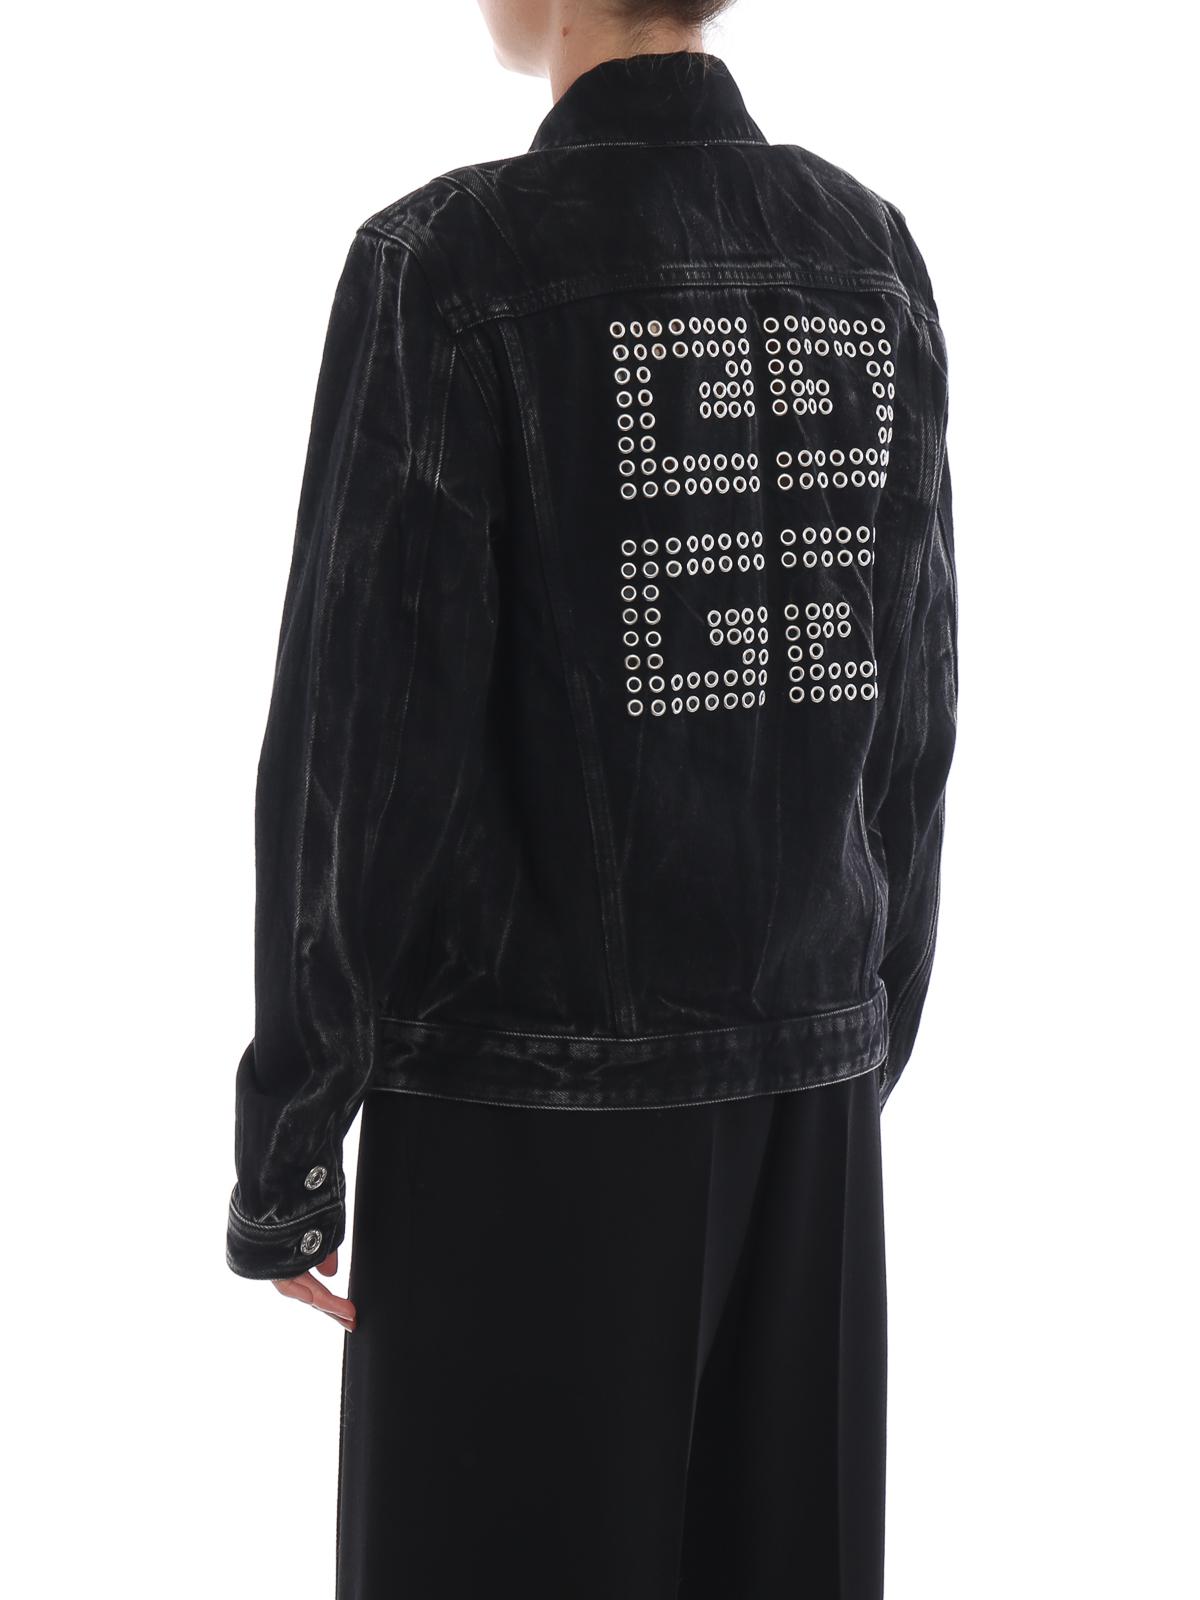 Chaquetas Denim Chaqueta Givenchy Vaquera Bw306h5049001 Negro TSwqvHT8nY